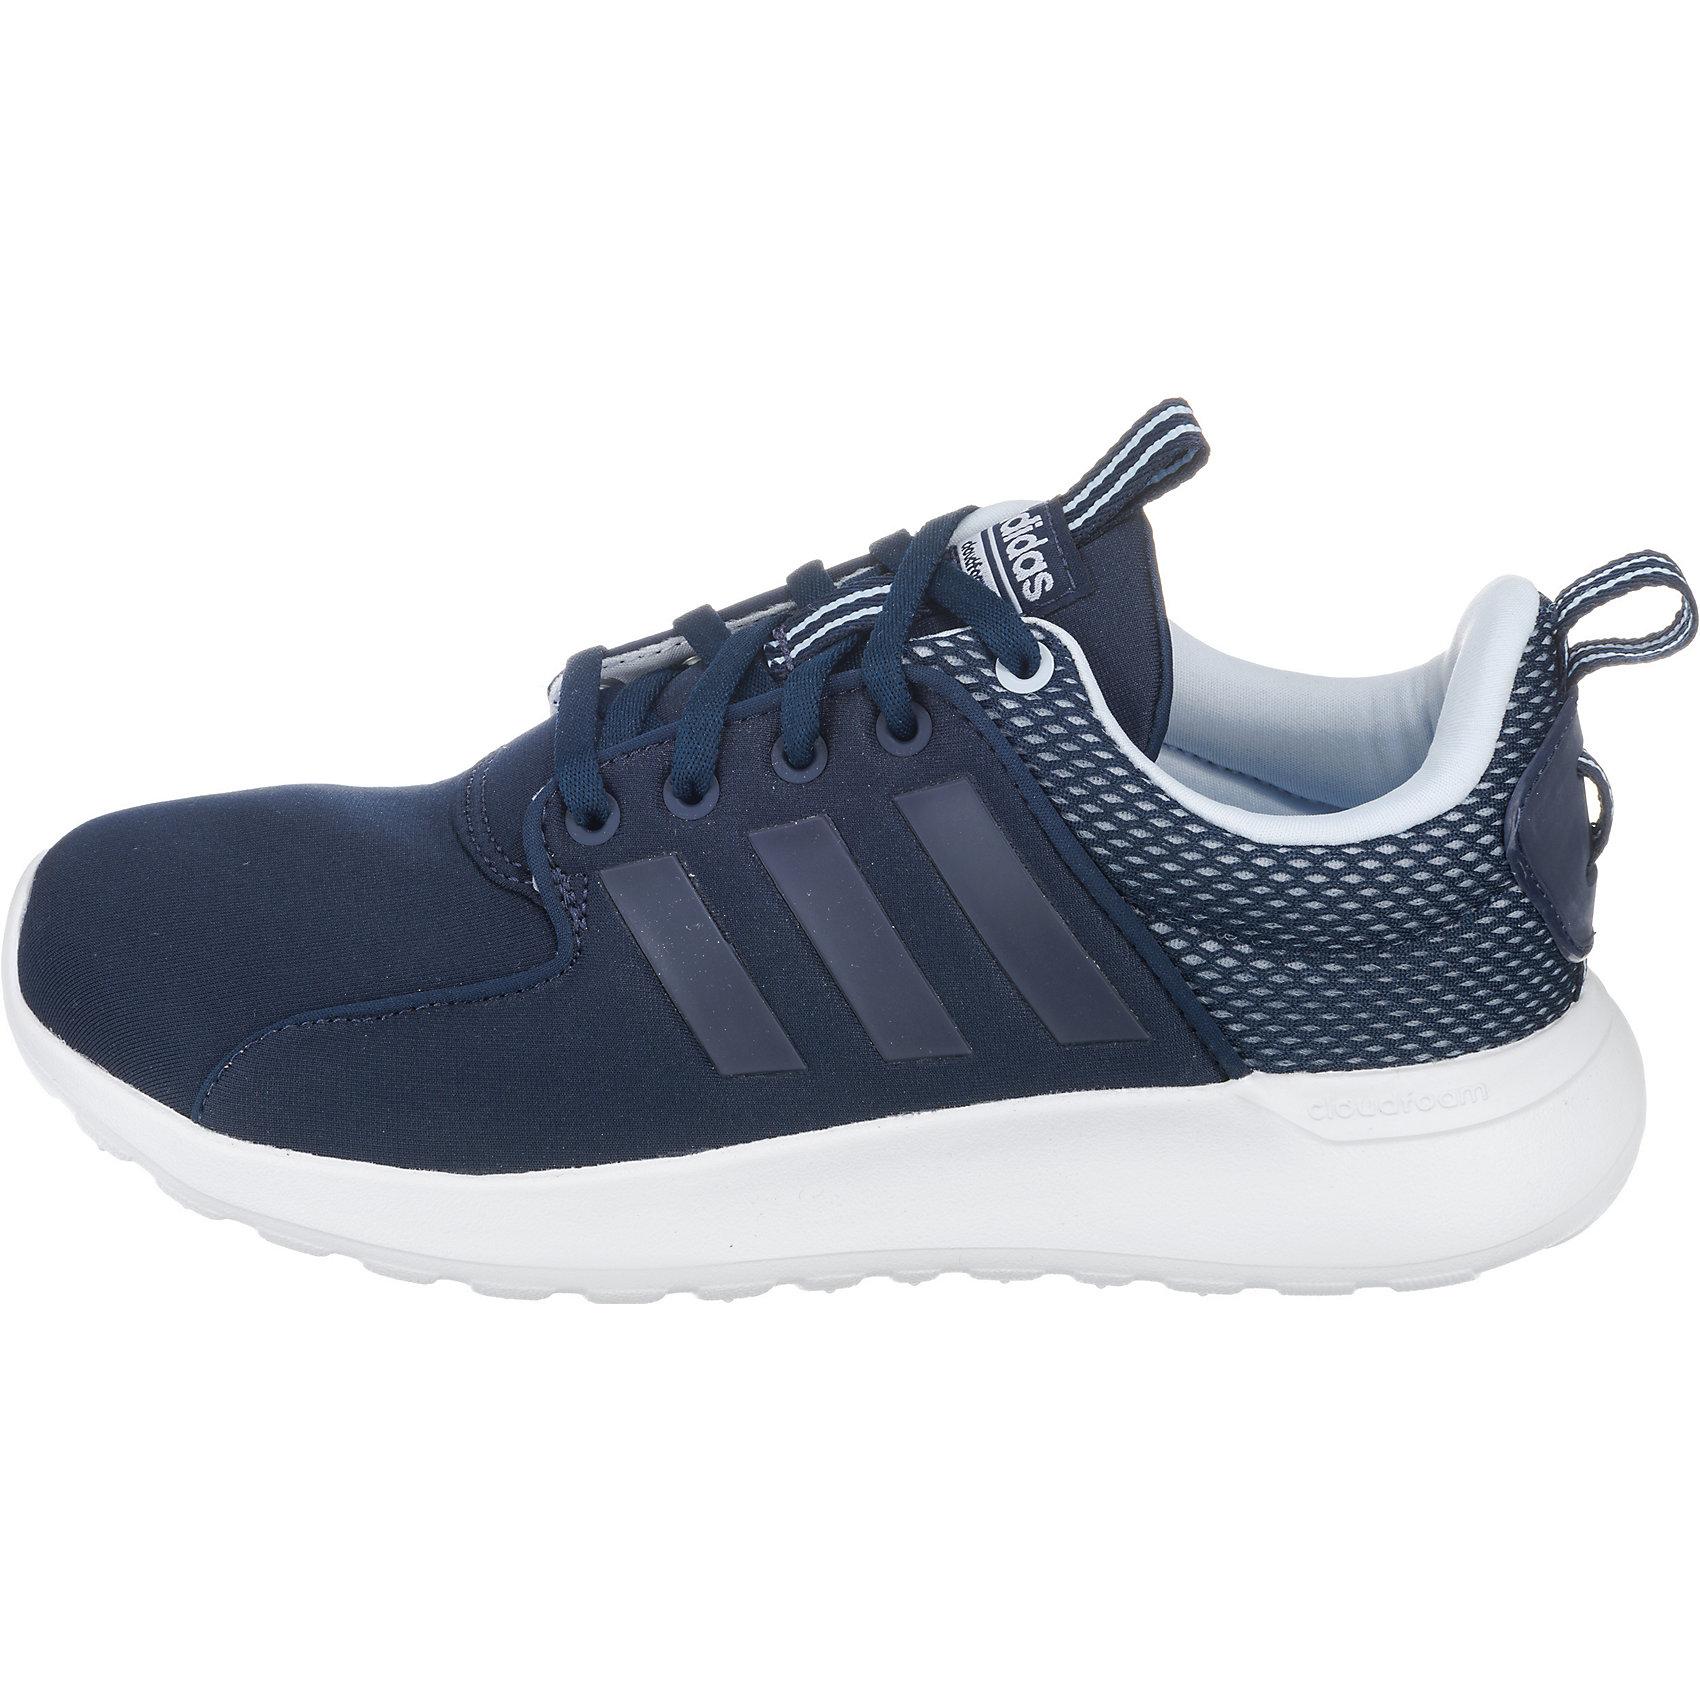 Adidas lite racer 2018 Mint Classic Frauen Sneaker NEU Sportschuhe Schuhe   eBay